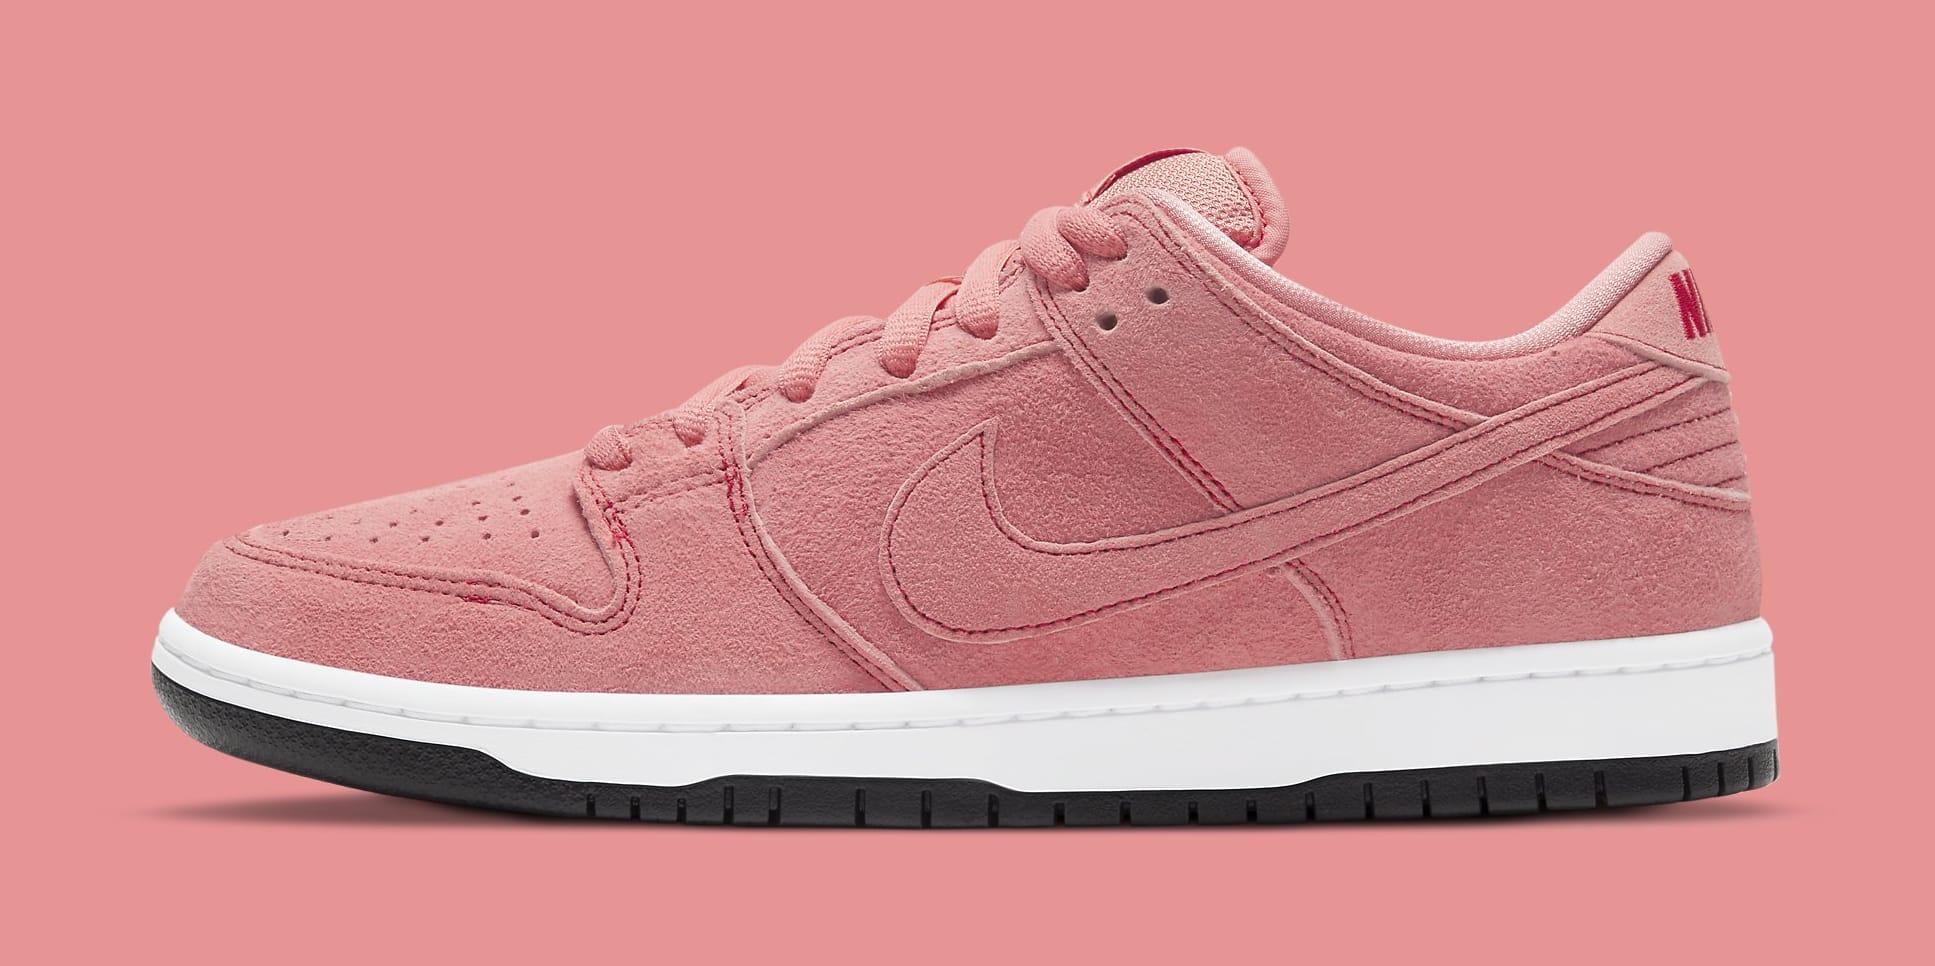 Nike SB Dunk Low 'Pink Pig' CV1655-600 Lateral